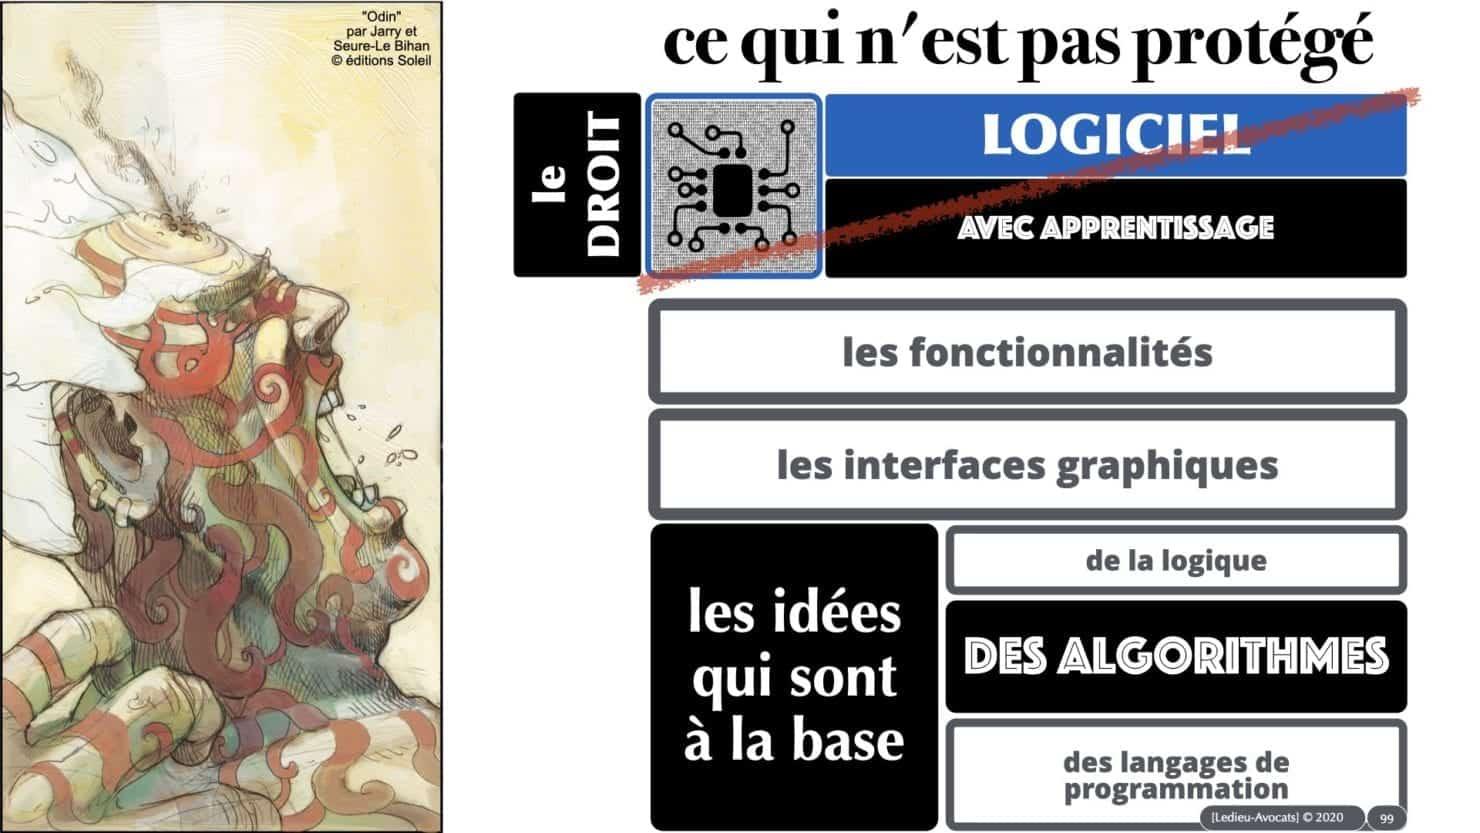 307 Intelligence artificielle-machine-learning-deep-learning-base de données-BIG-DATA *16:9* Constellation ©Ledieu-Avocat-13-10-2020.099